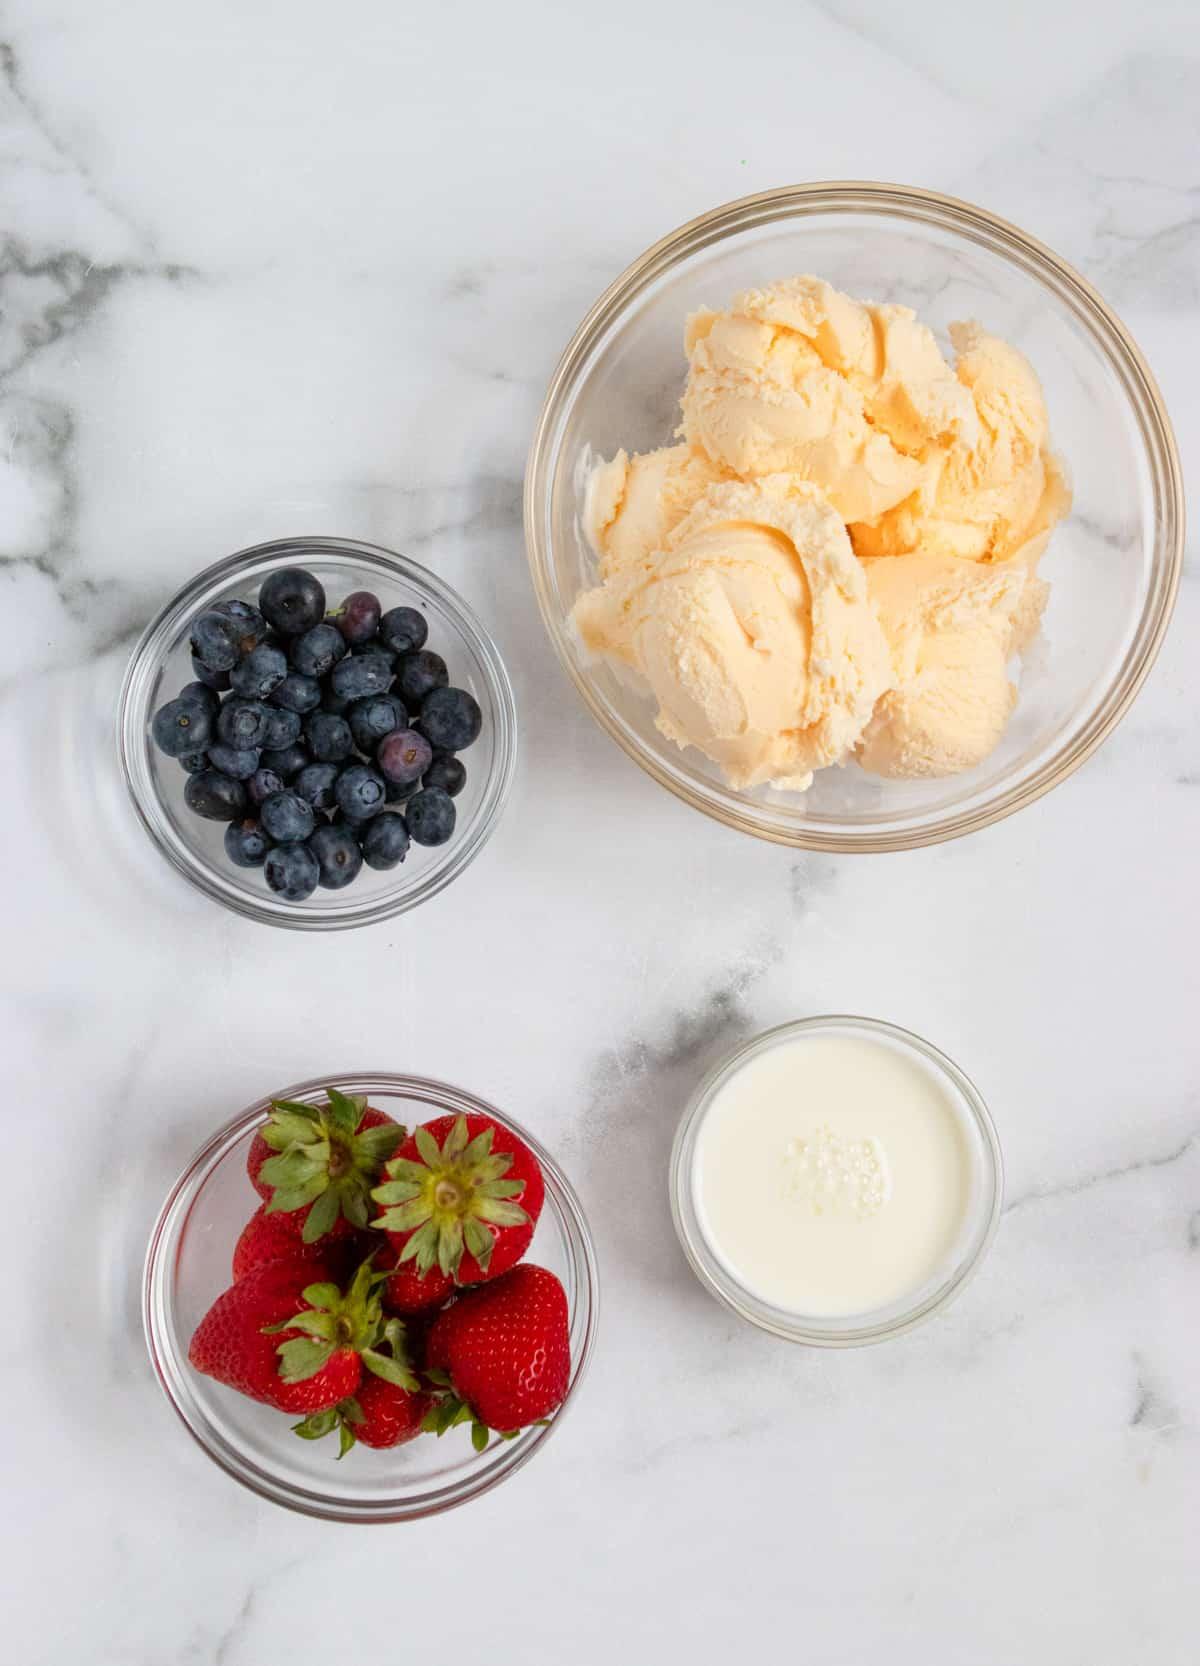 vanilla ice cream, milk and berries on counter.